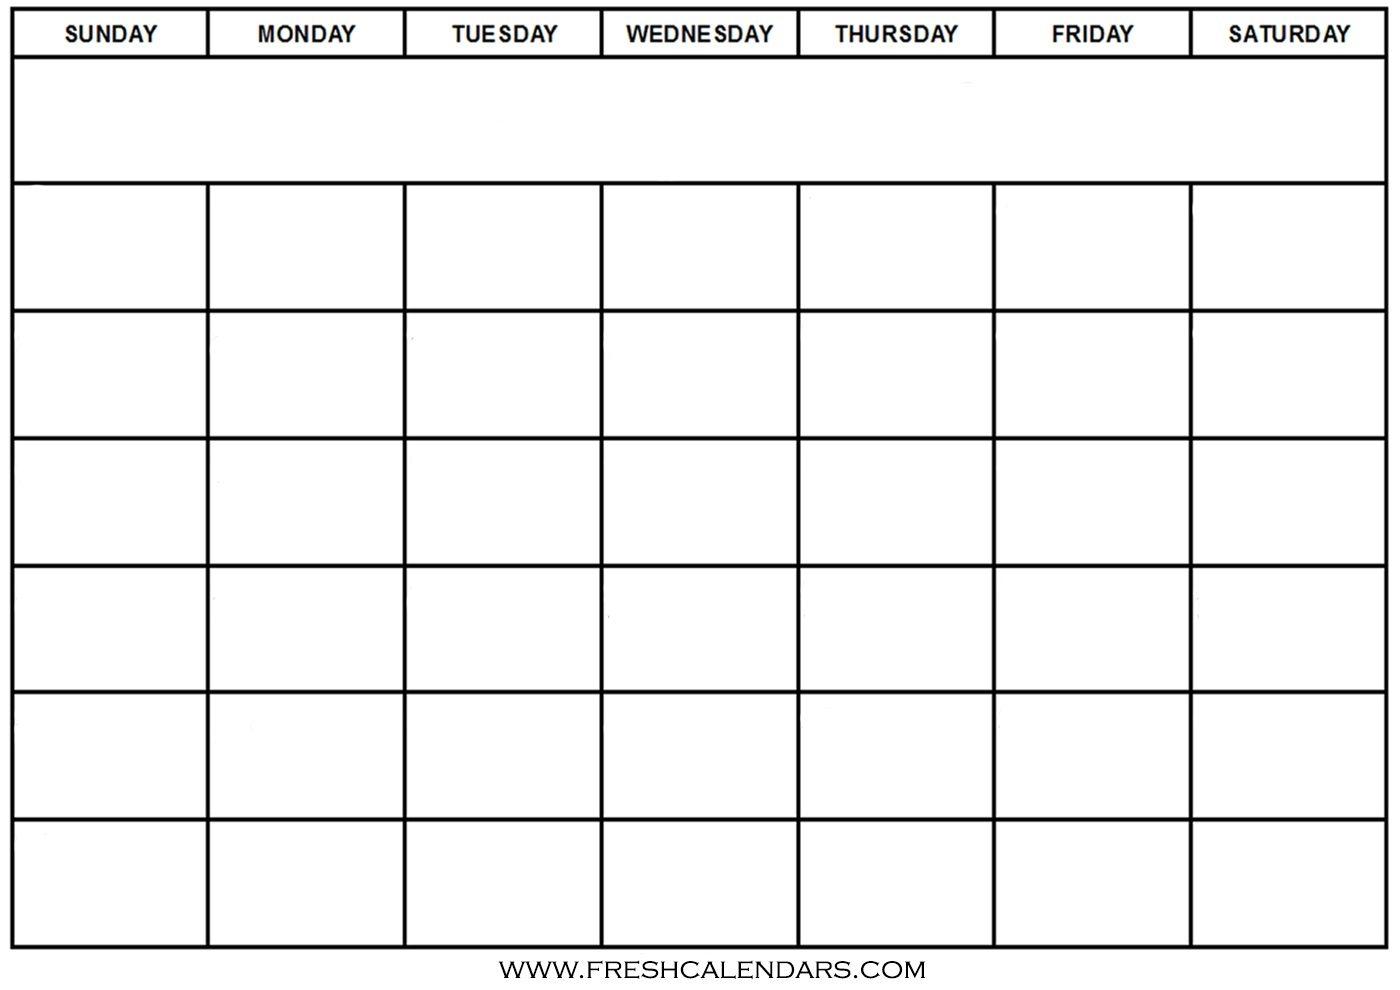 Printable Calendar Templates Full Page  Calendar with Full Page Blank Calendar